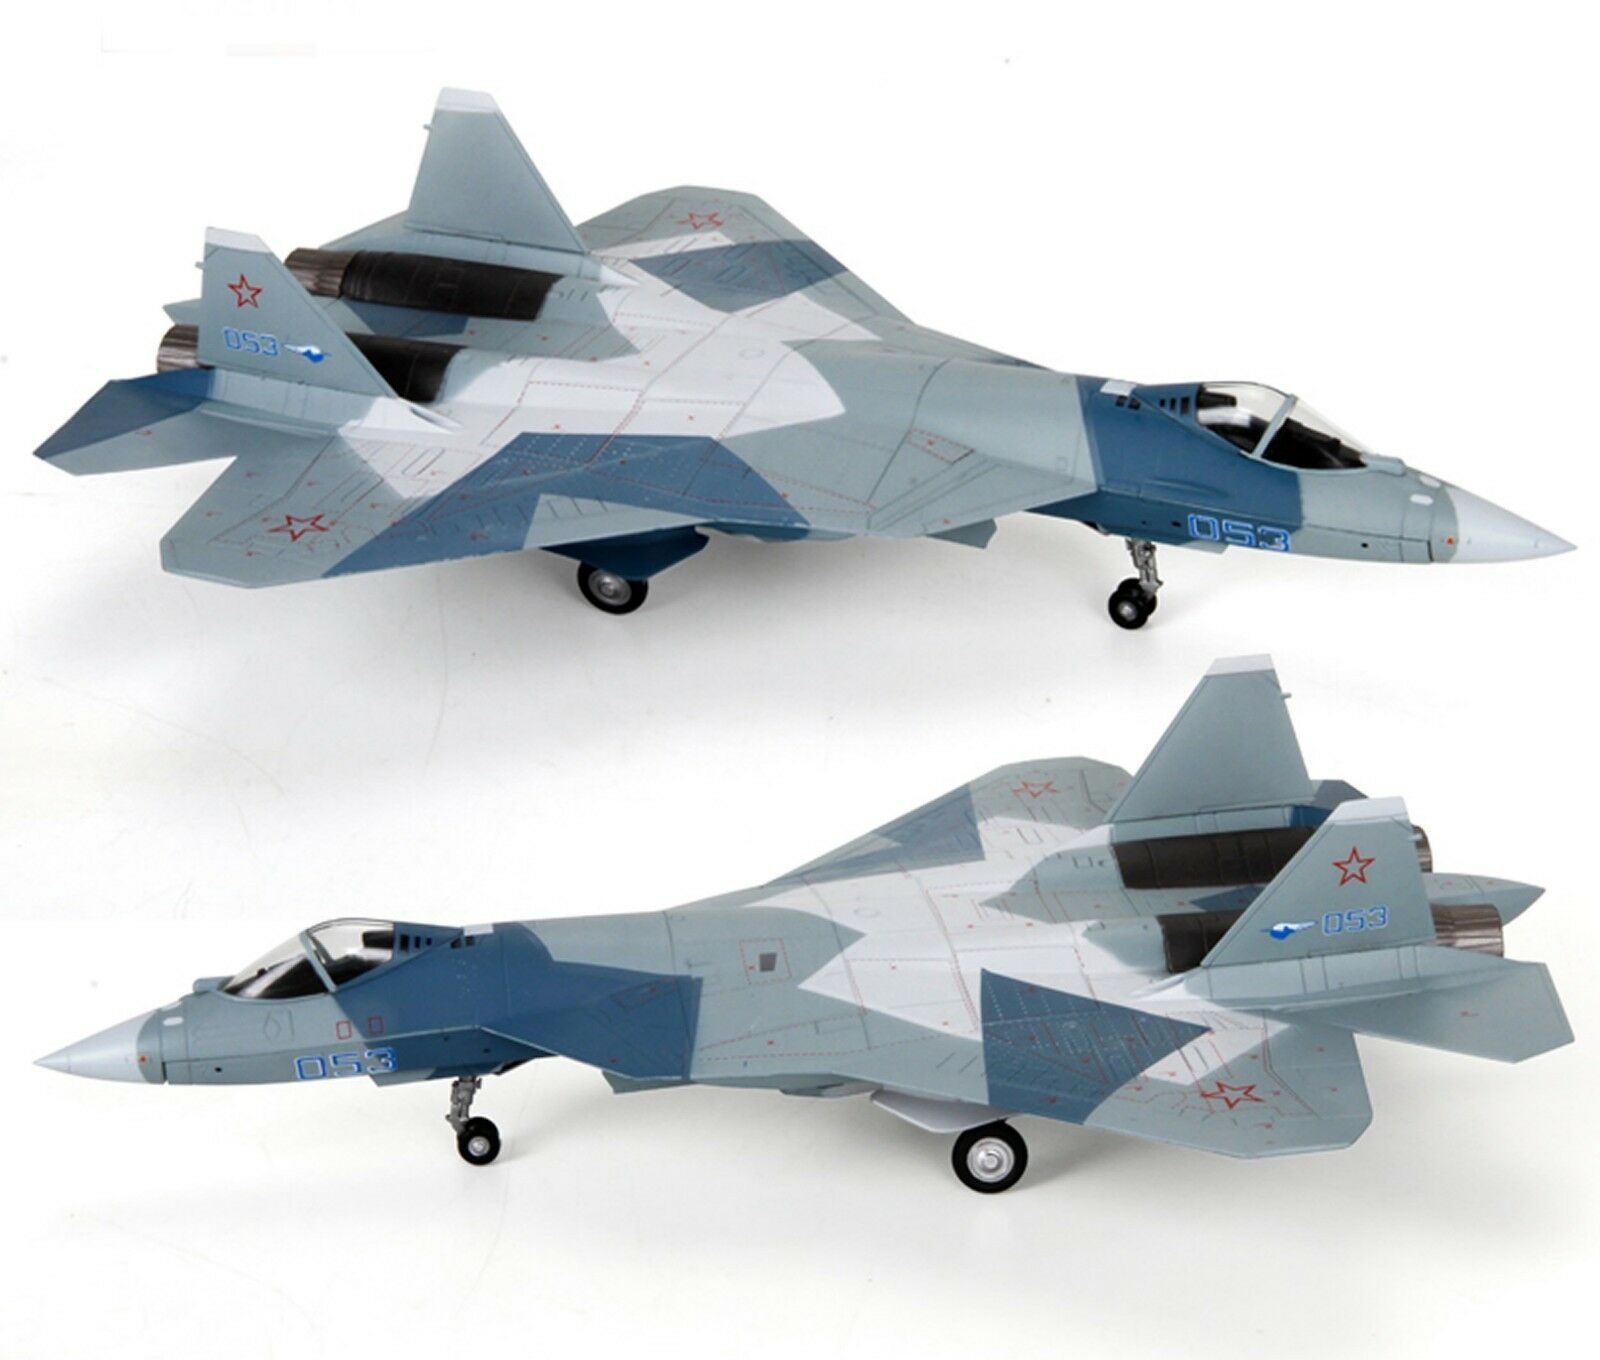 AF1 1 72 ruso Sukhoi T-50 (Su-57) Modelo Diecast Fighter